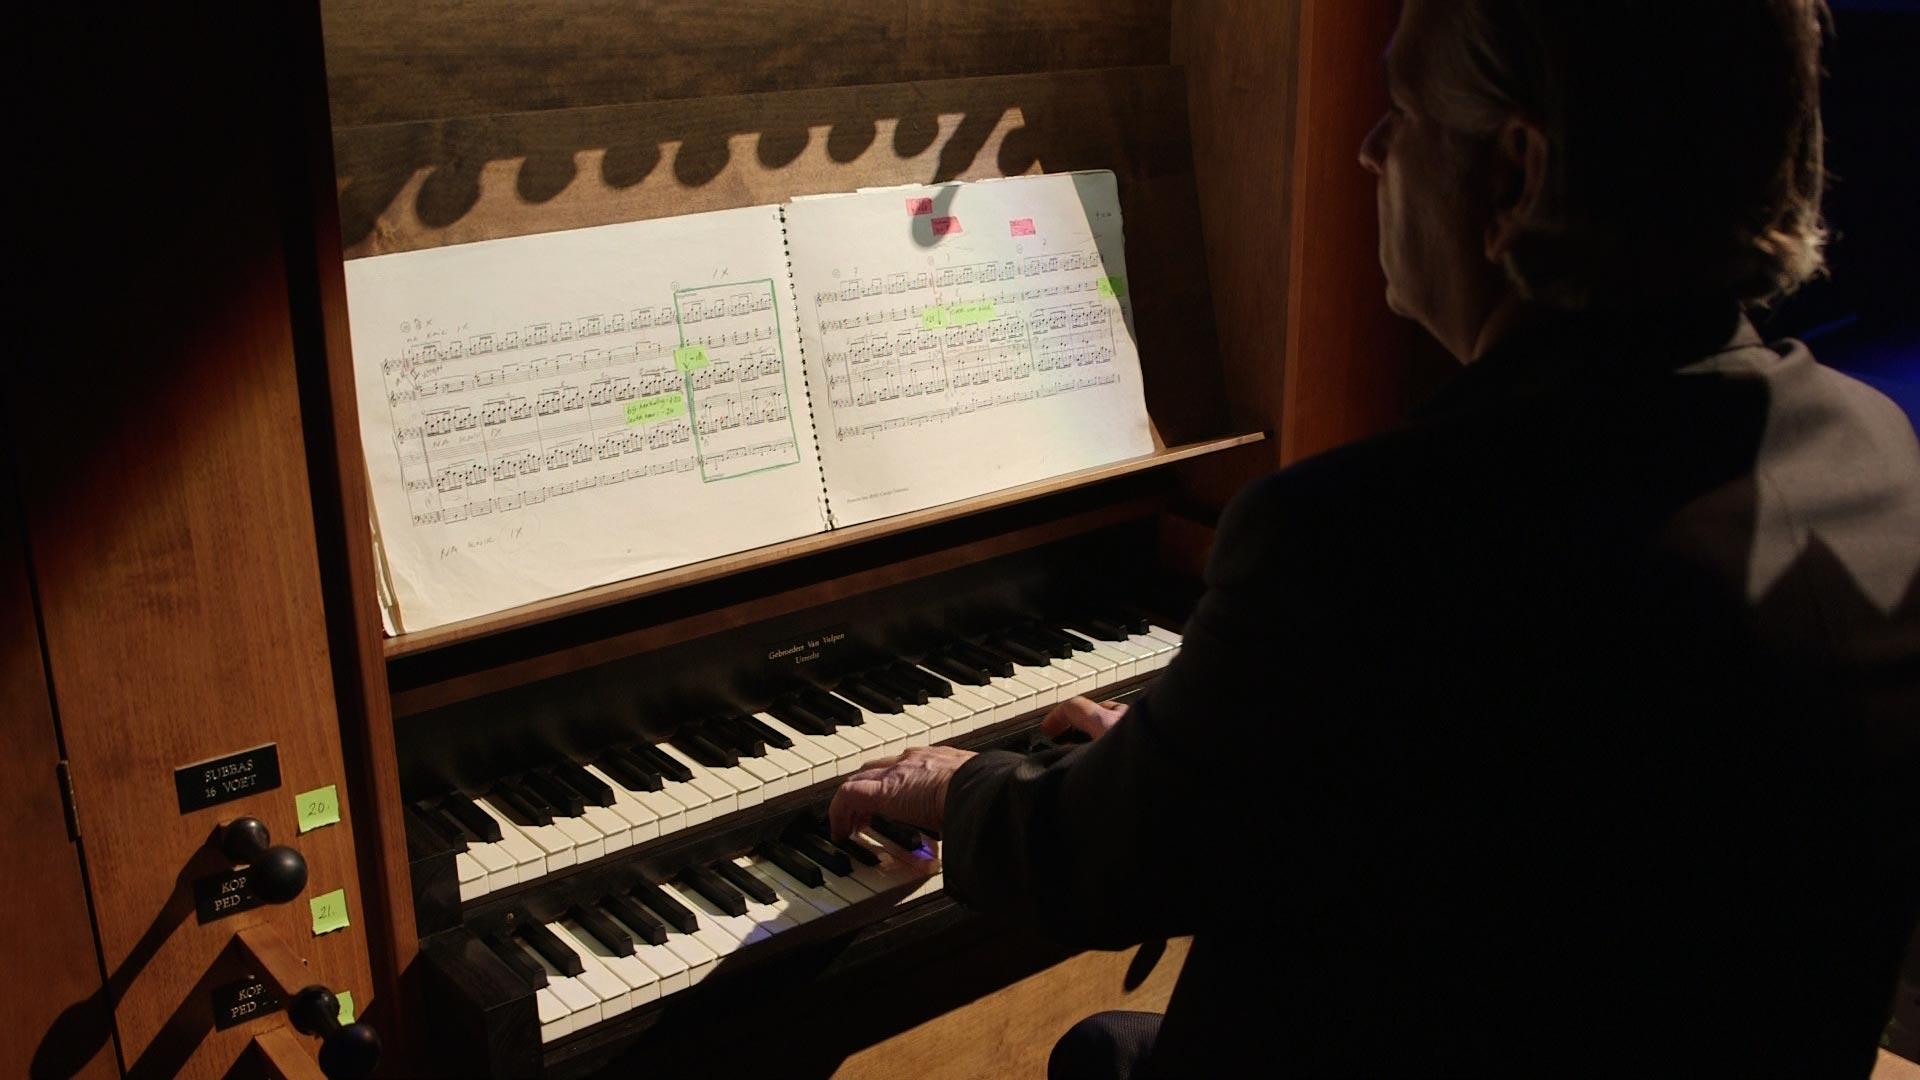 Aart Bergwerff, organist, east meets west, derwisch dans, orgel, vis film producties, Breda, Tivoli Vredenburg, Utrecht, canto ostinato, Simeon ten holt